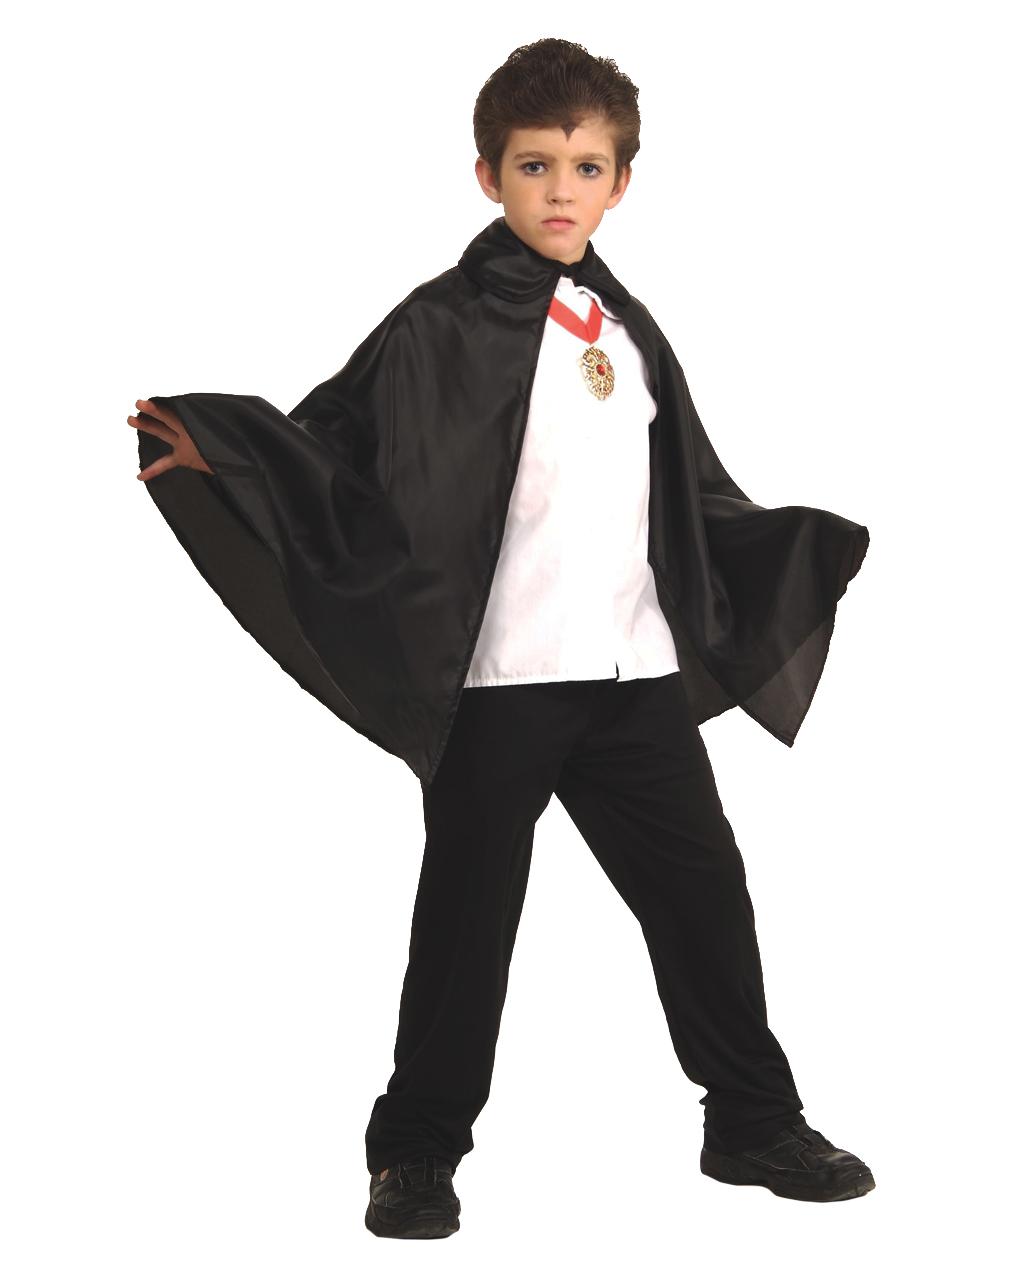 Baby Vampir Mit Umhang Kostum Fur Kinder Karneval Fasching Halloween